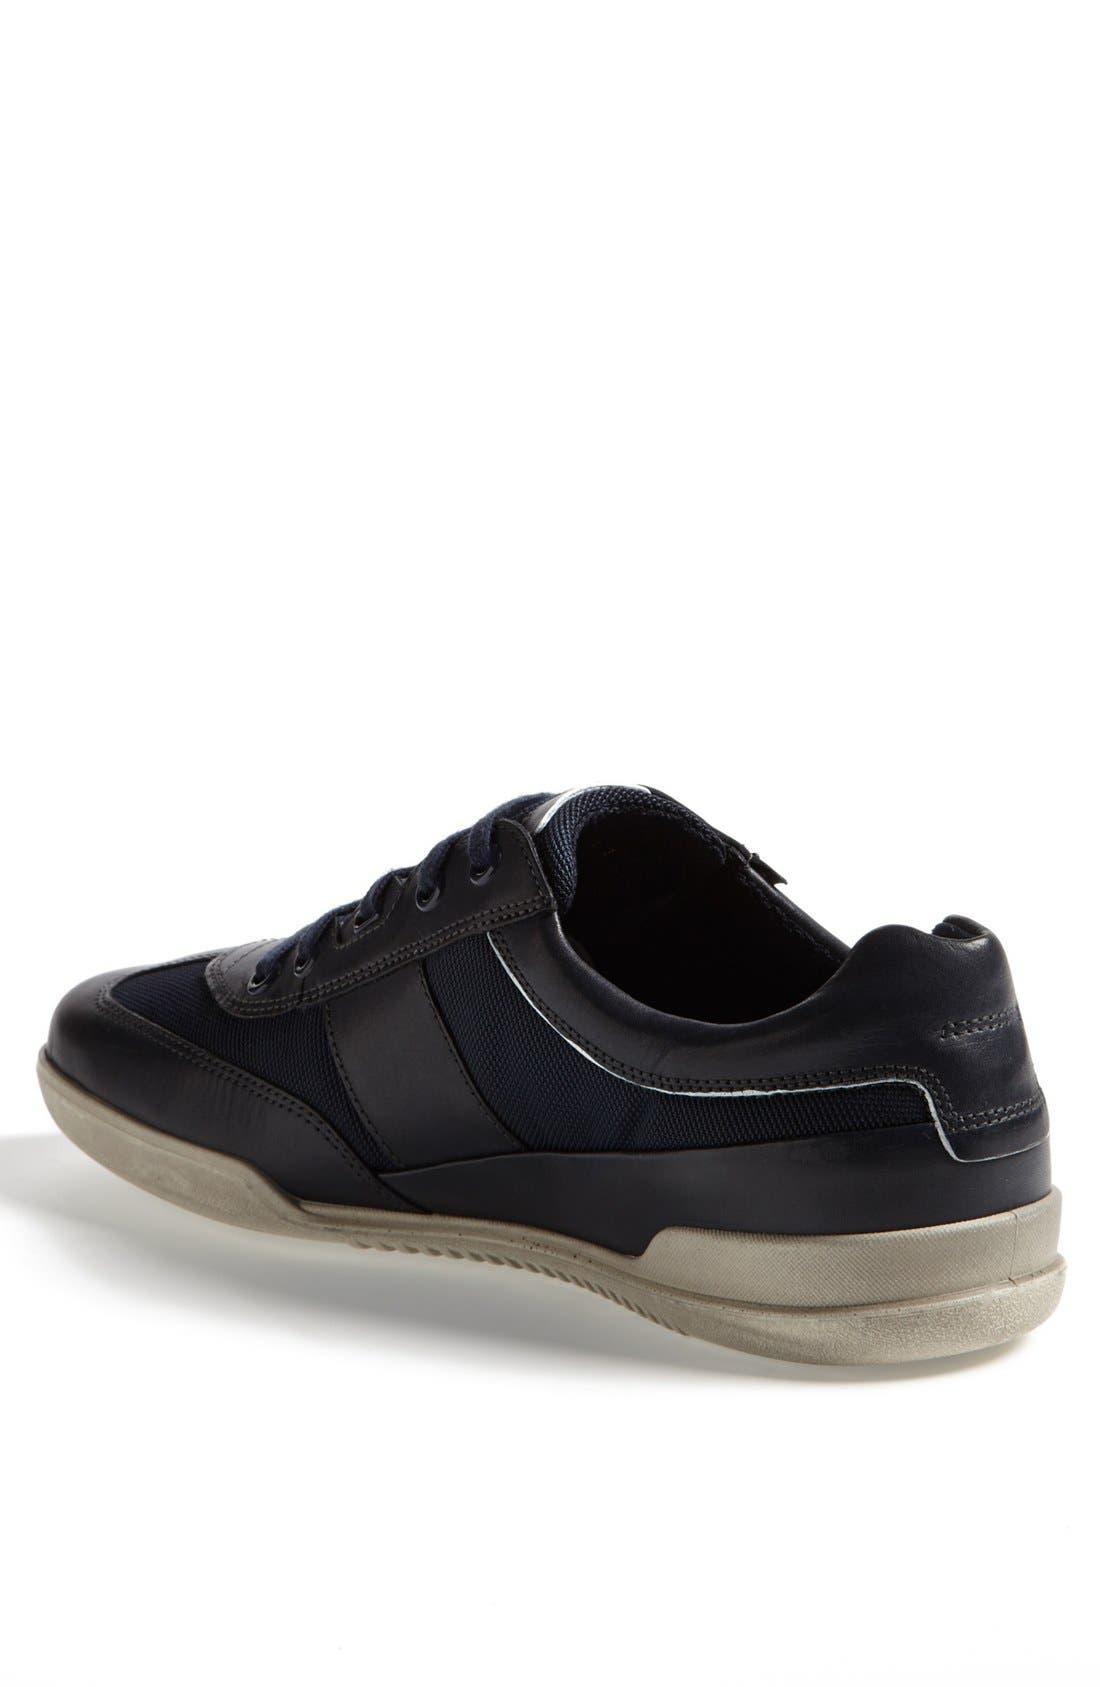 Alternate Image 2  - ECCO 'Enrico' Sneaker